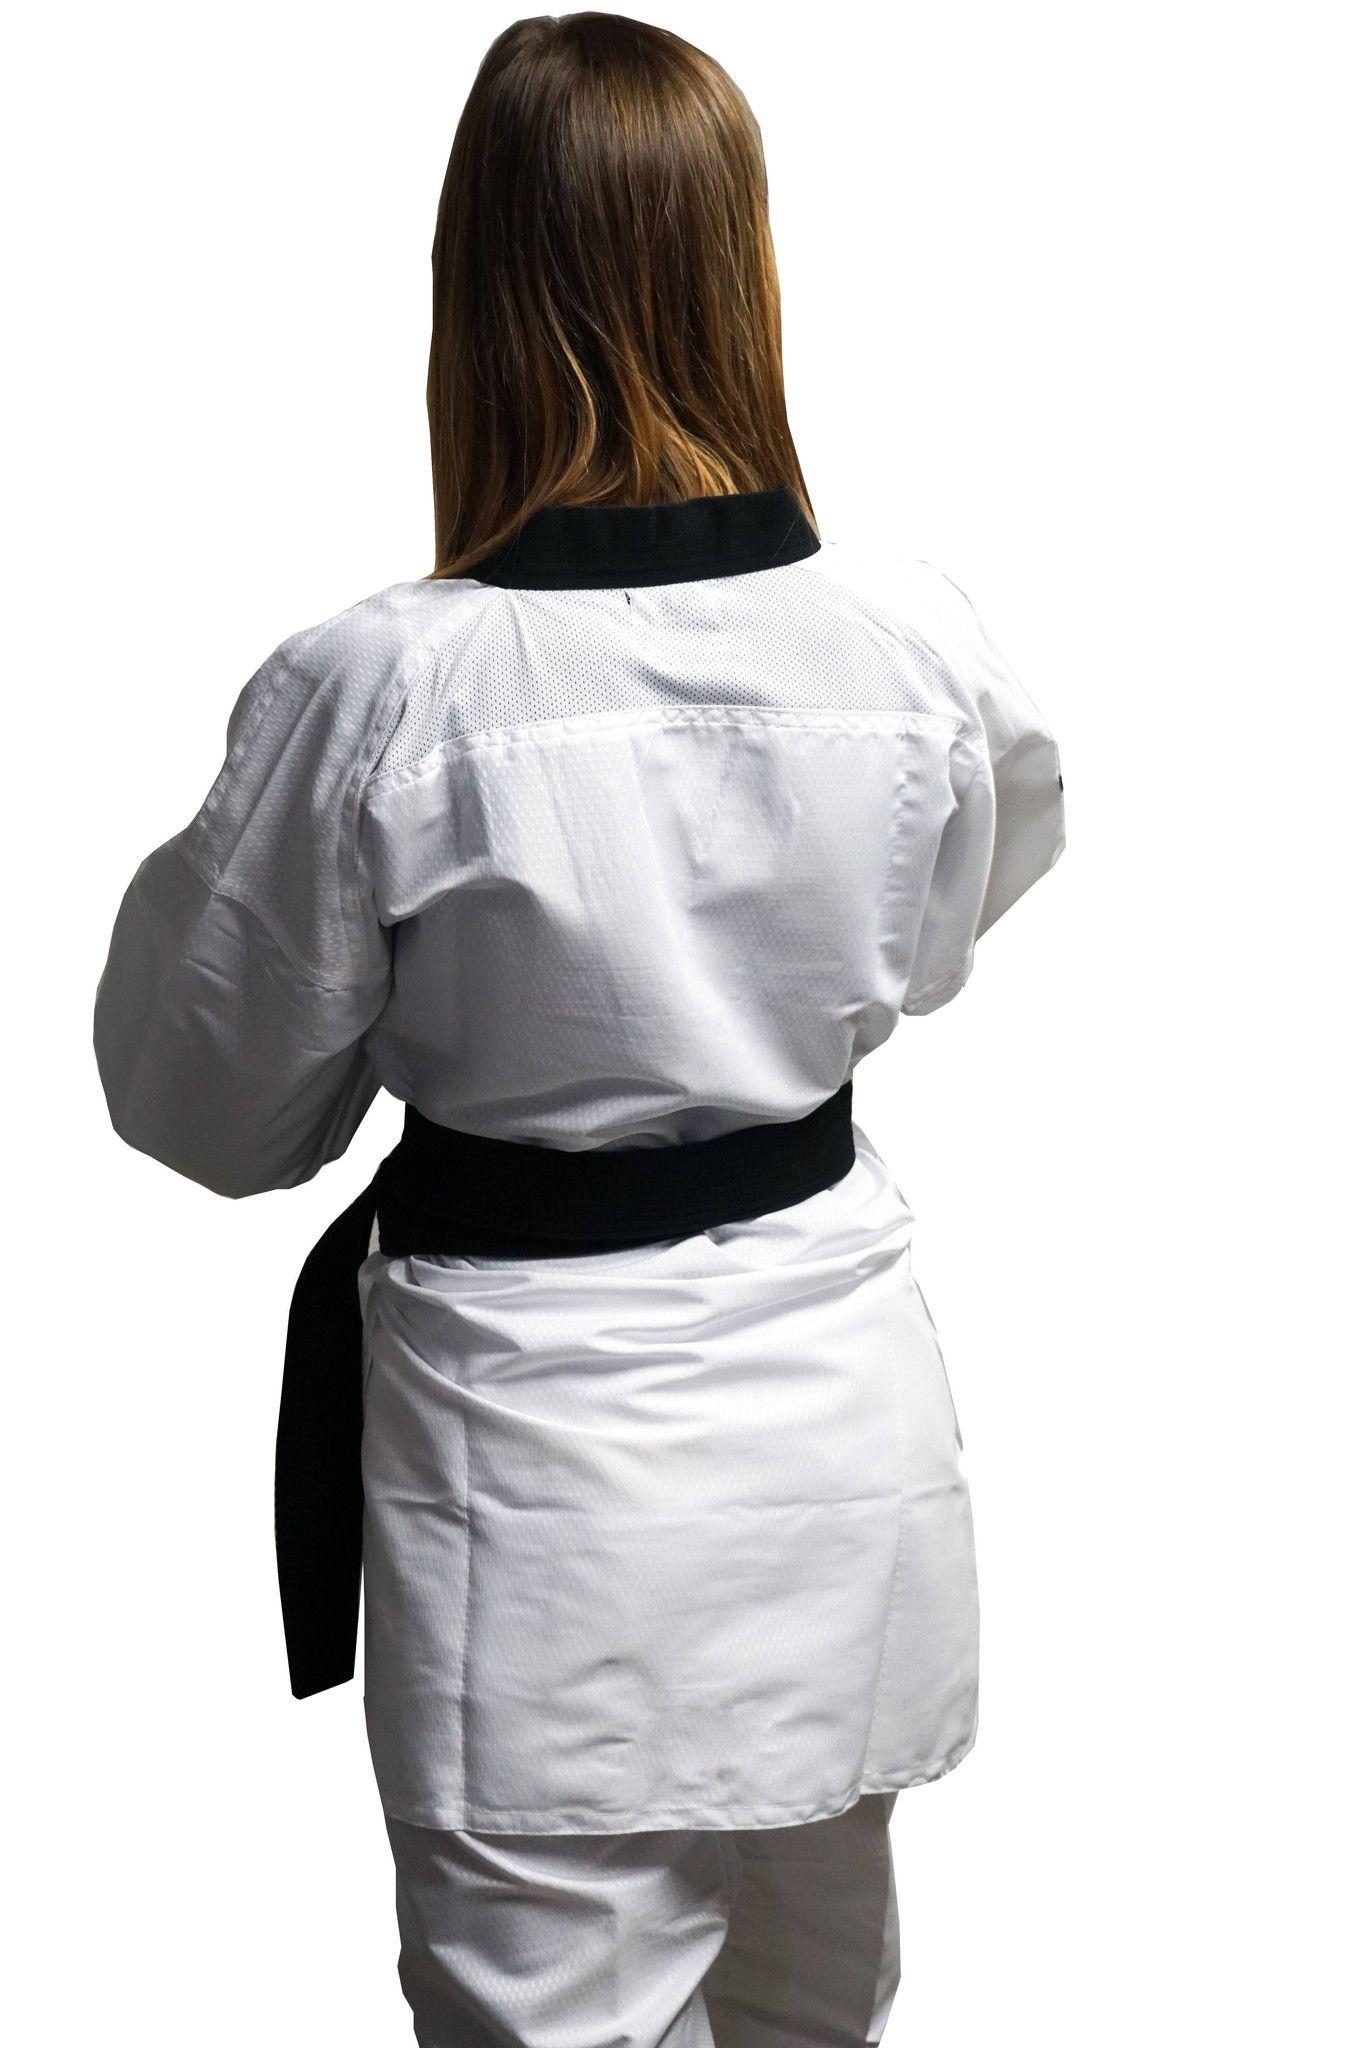 Tusah - Dobok EasyFit Fighter Ultraleggero per Taekwondo Omologato WT collo Nero